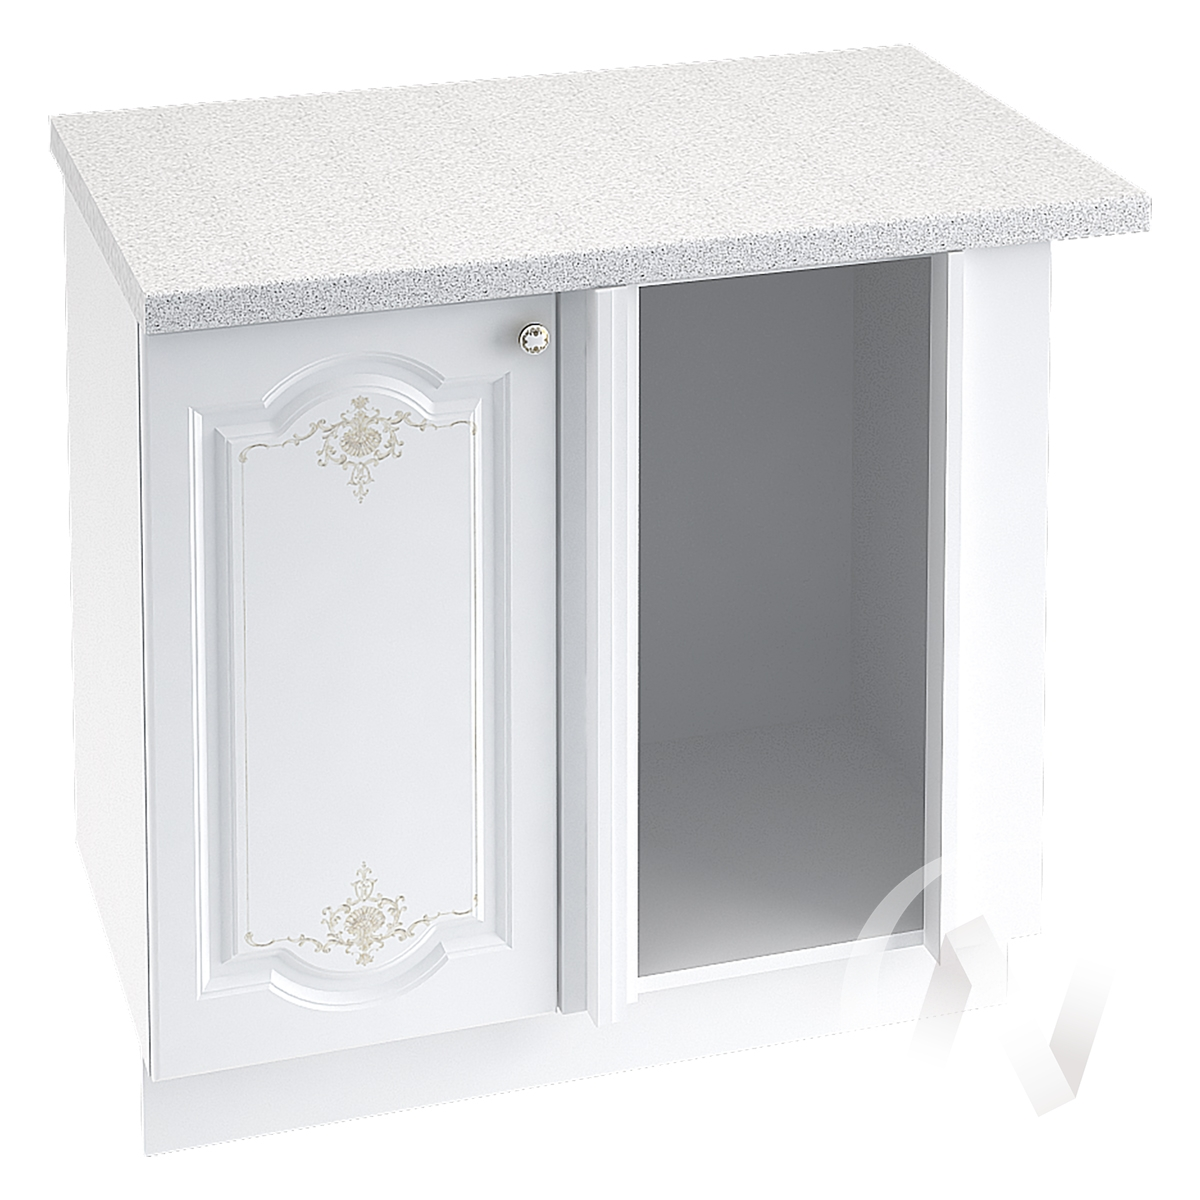 "Кухня ""Шарлиз"": Шкаф нижний угловой 990М, ШНУ 990М (корпус белый)"